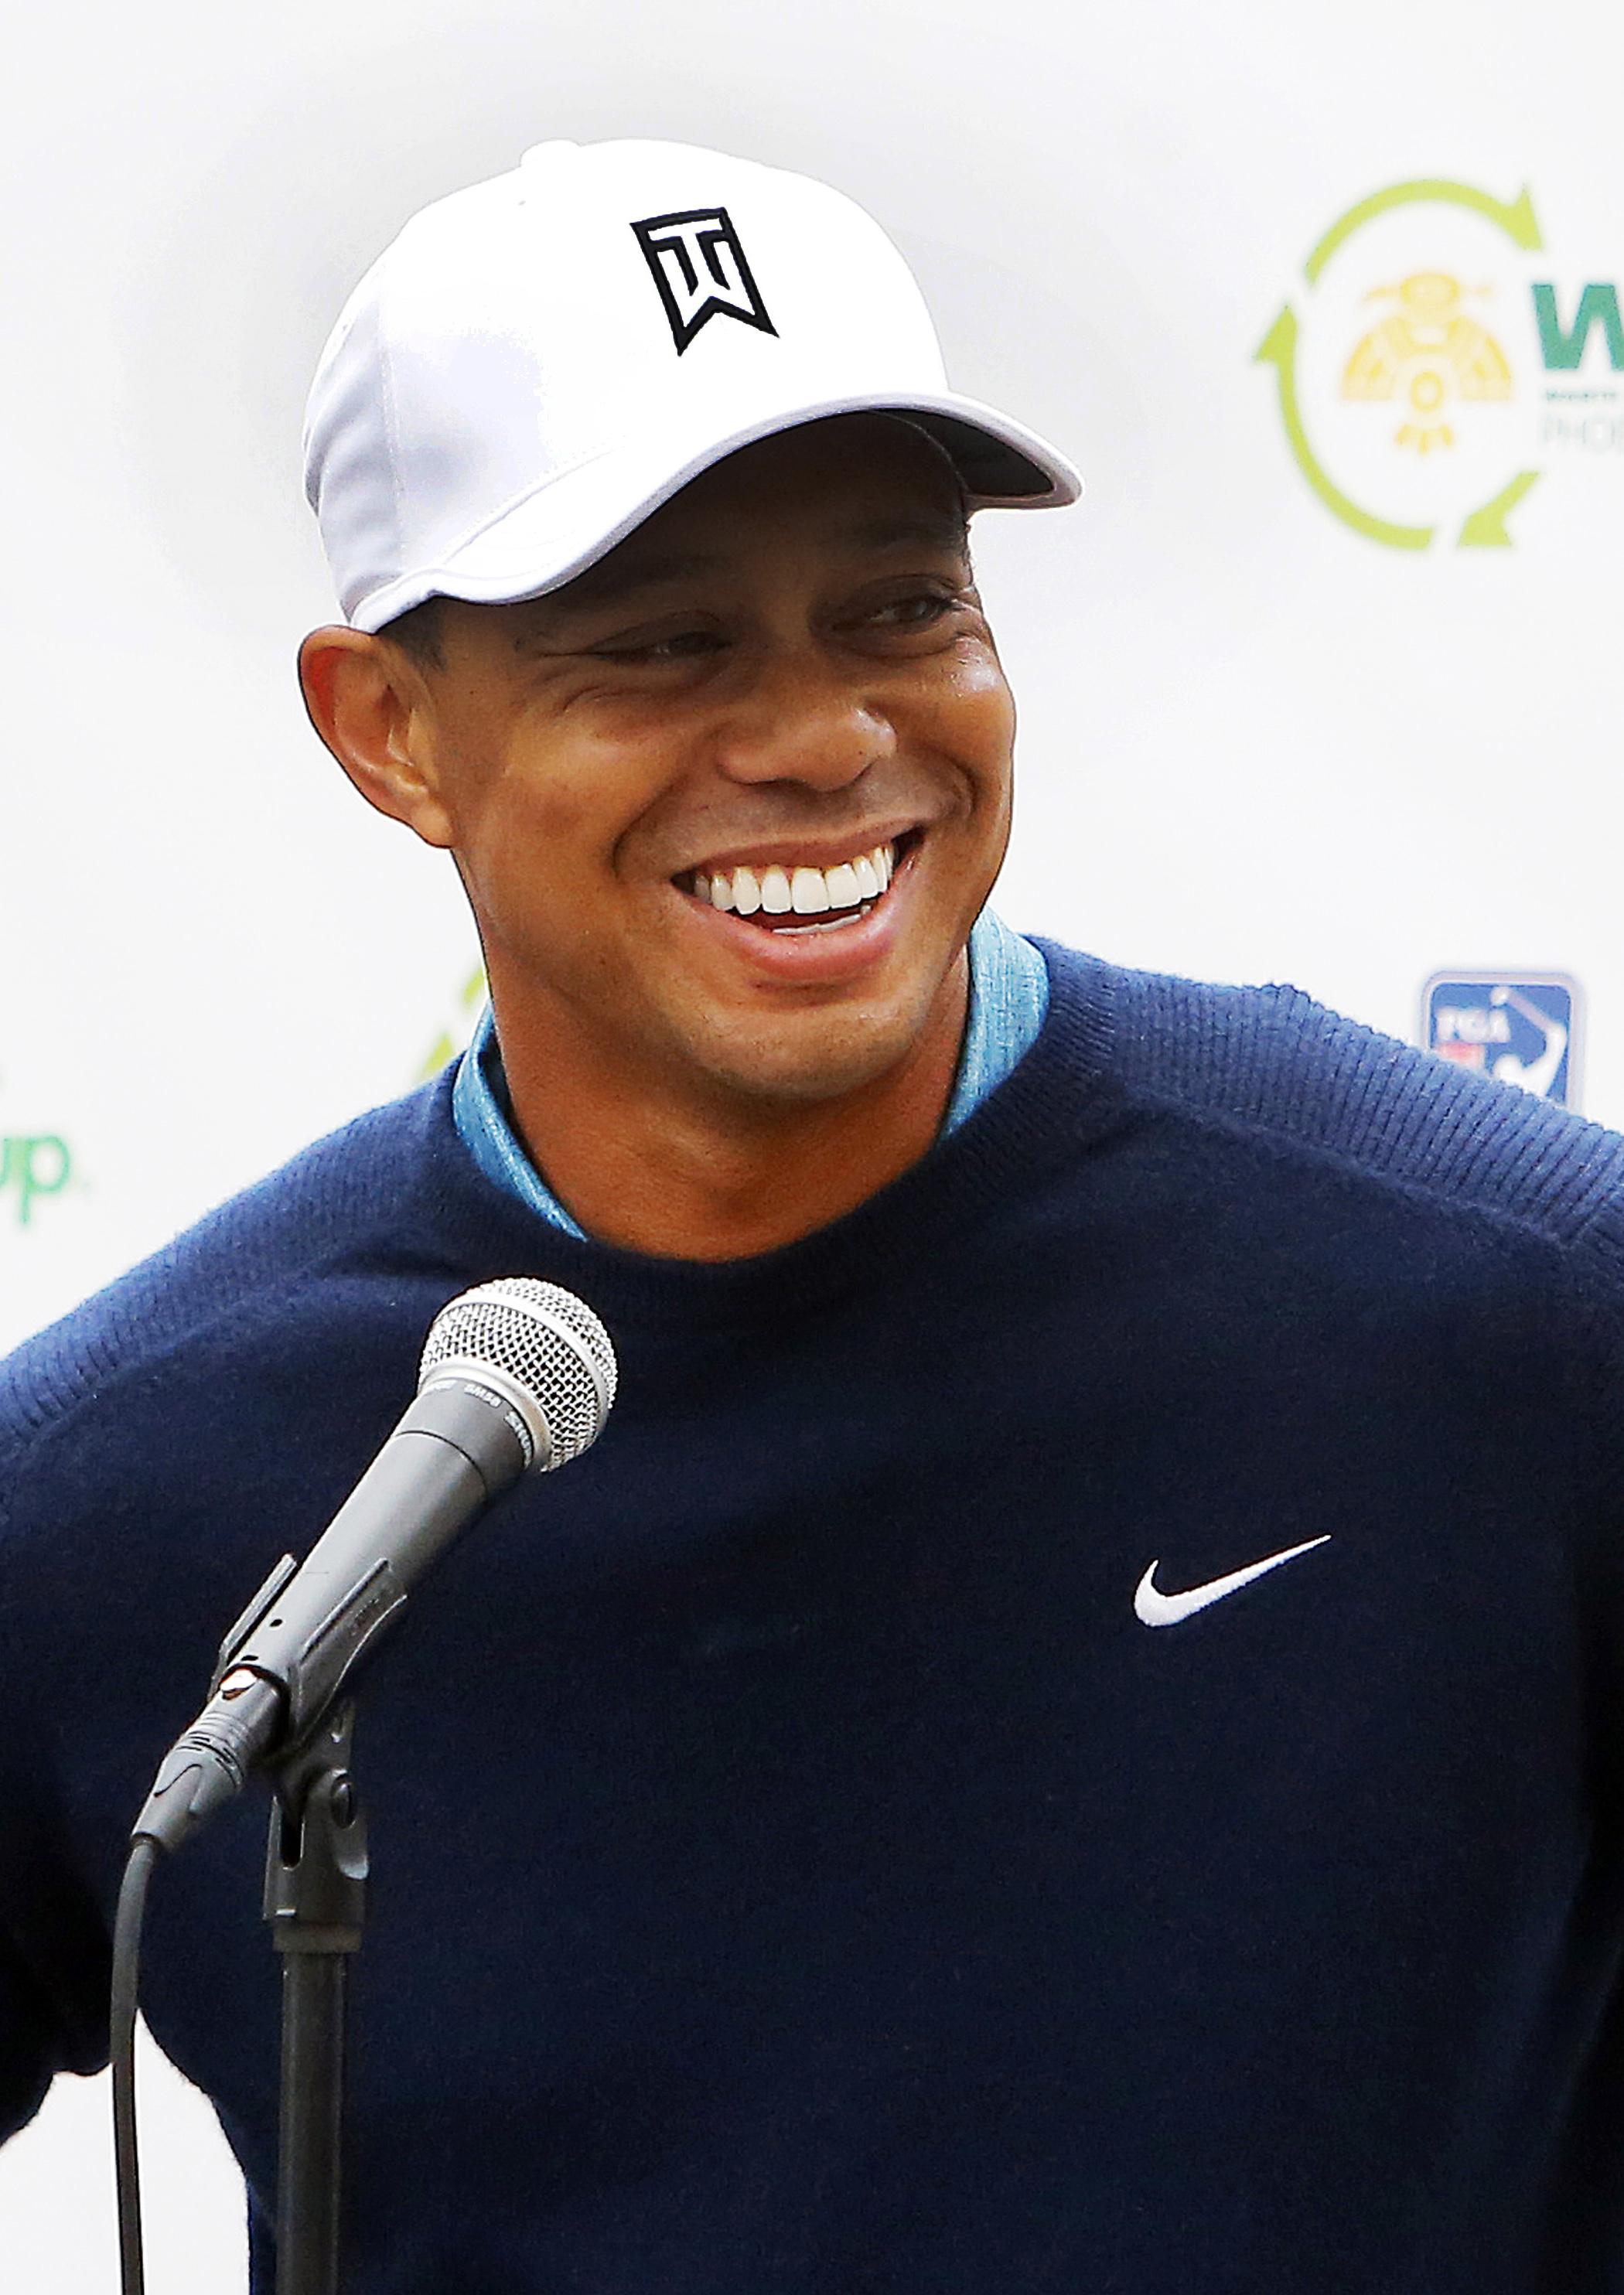 Tiger Woods talks to the media in Scottsdale, Ariz. on Jan. 27, 2015.